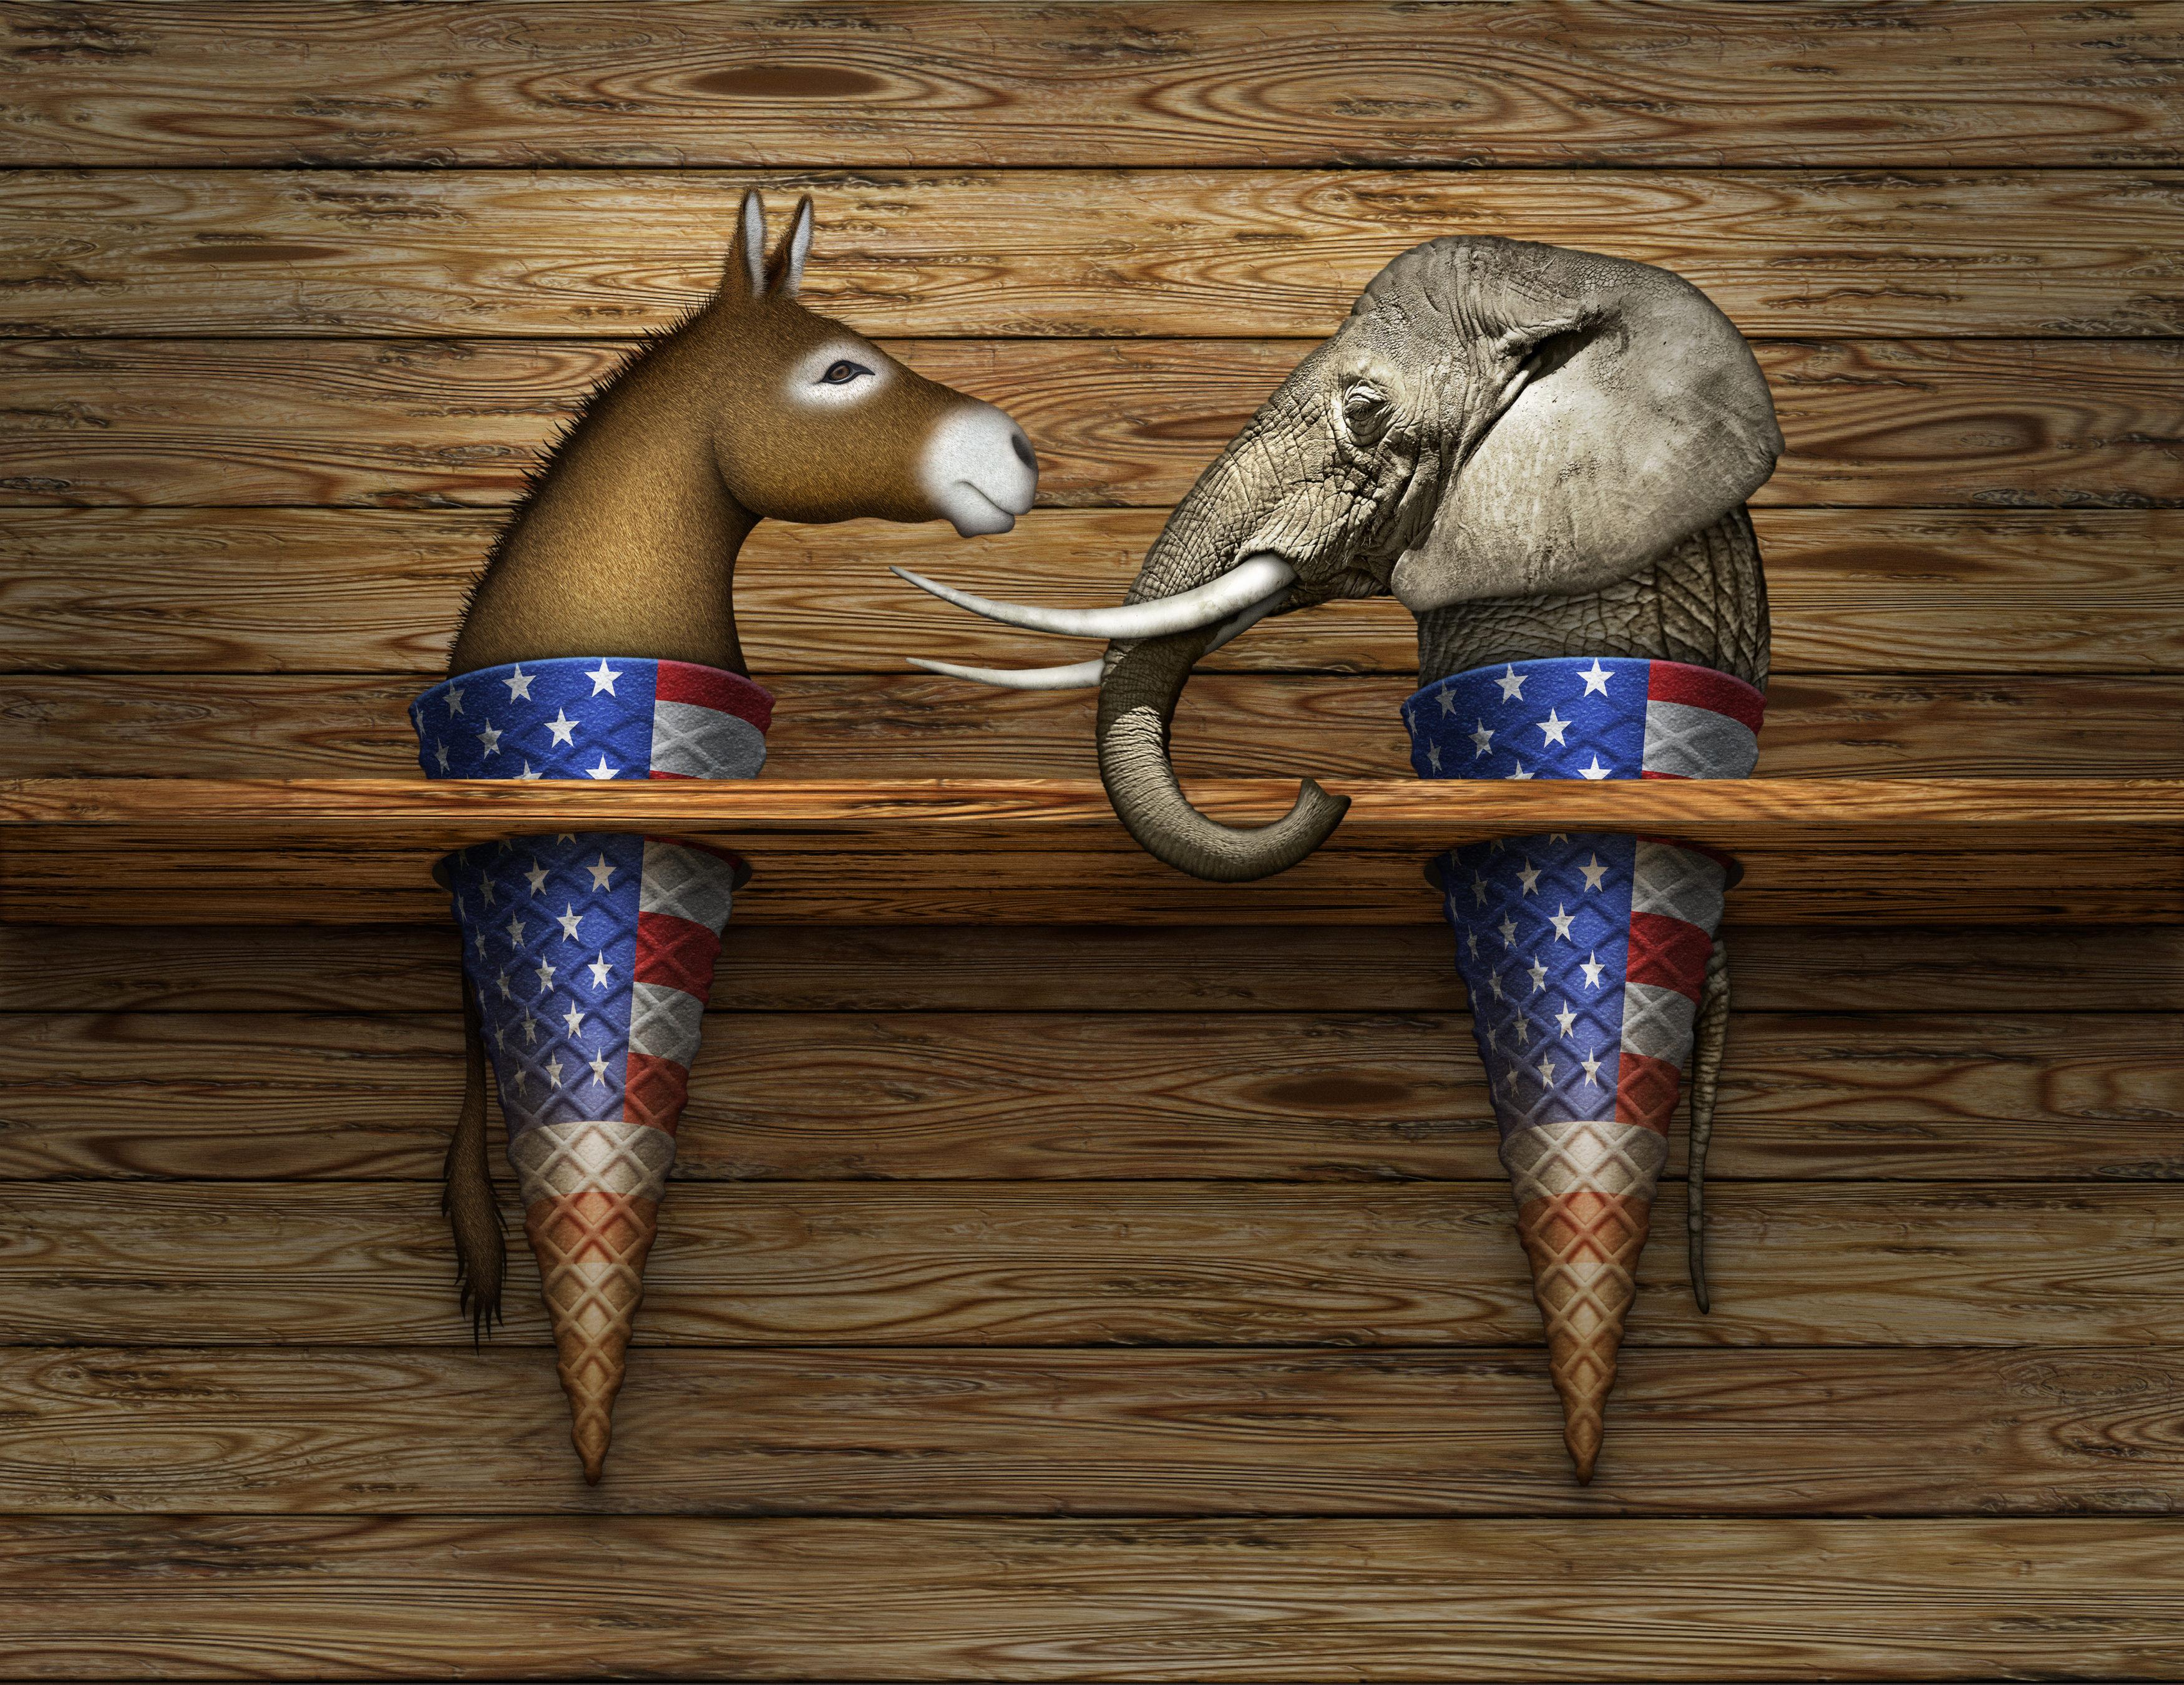 Political Elephant and Donkey Ice Cream Cones